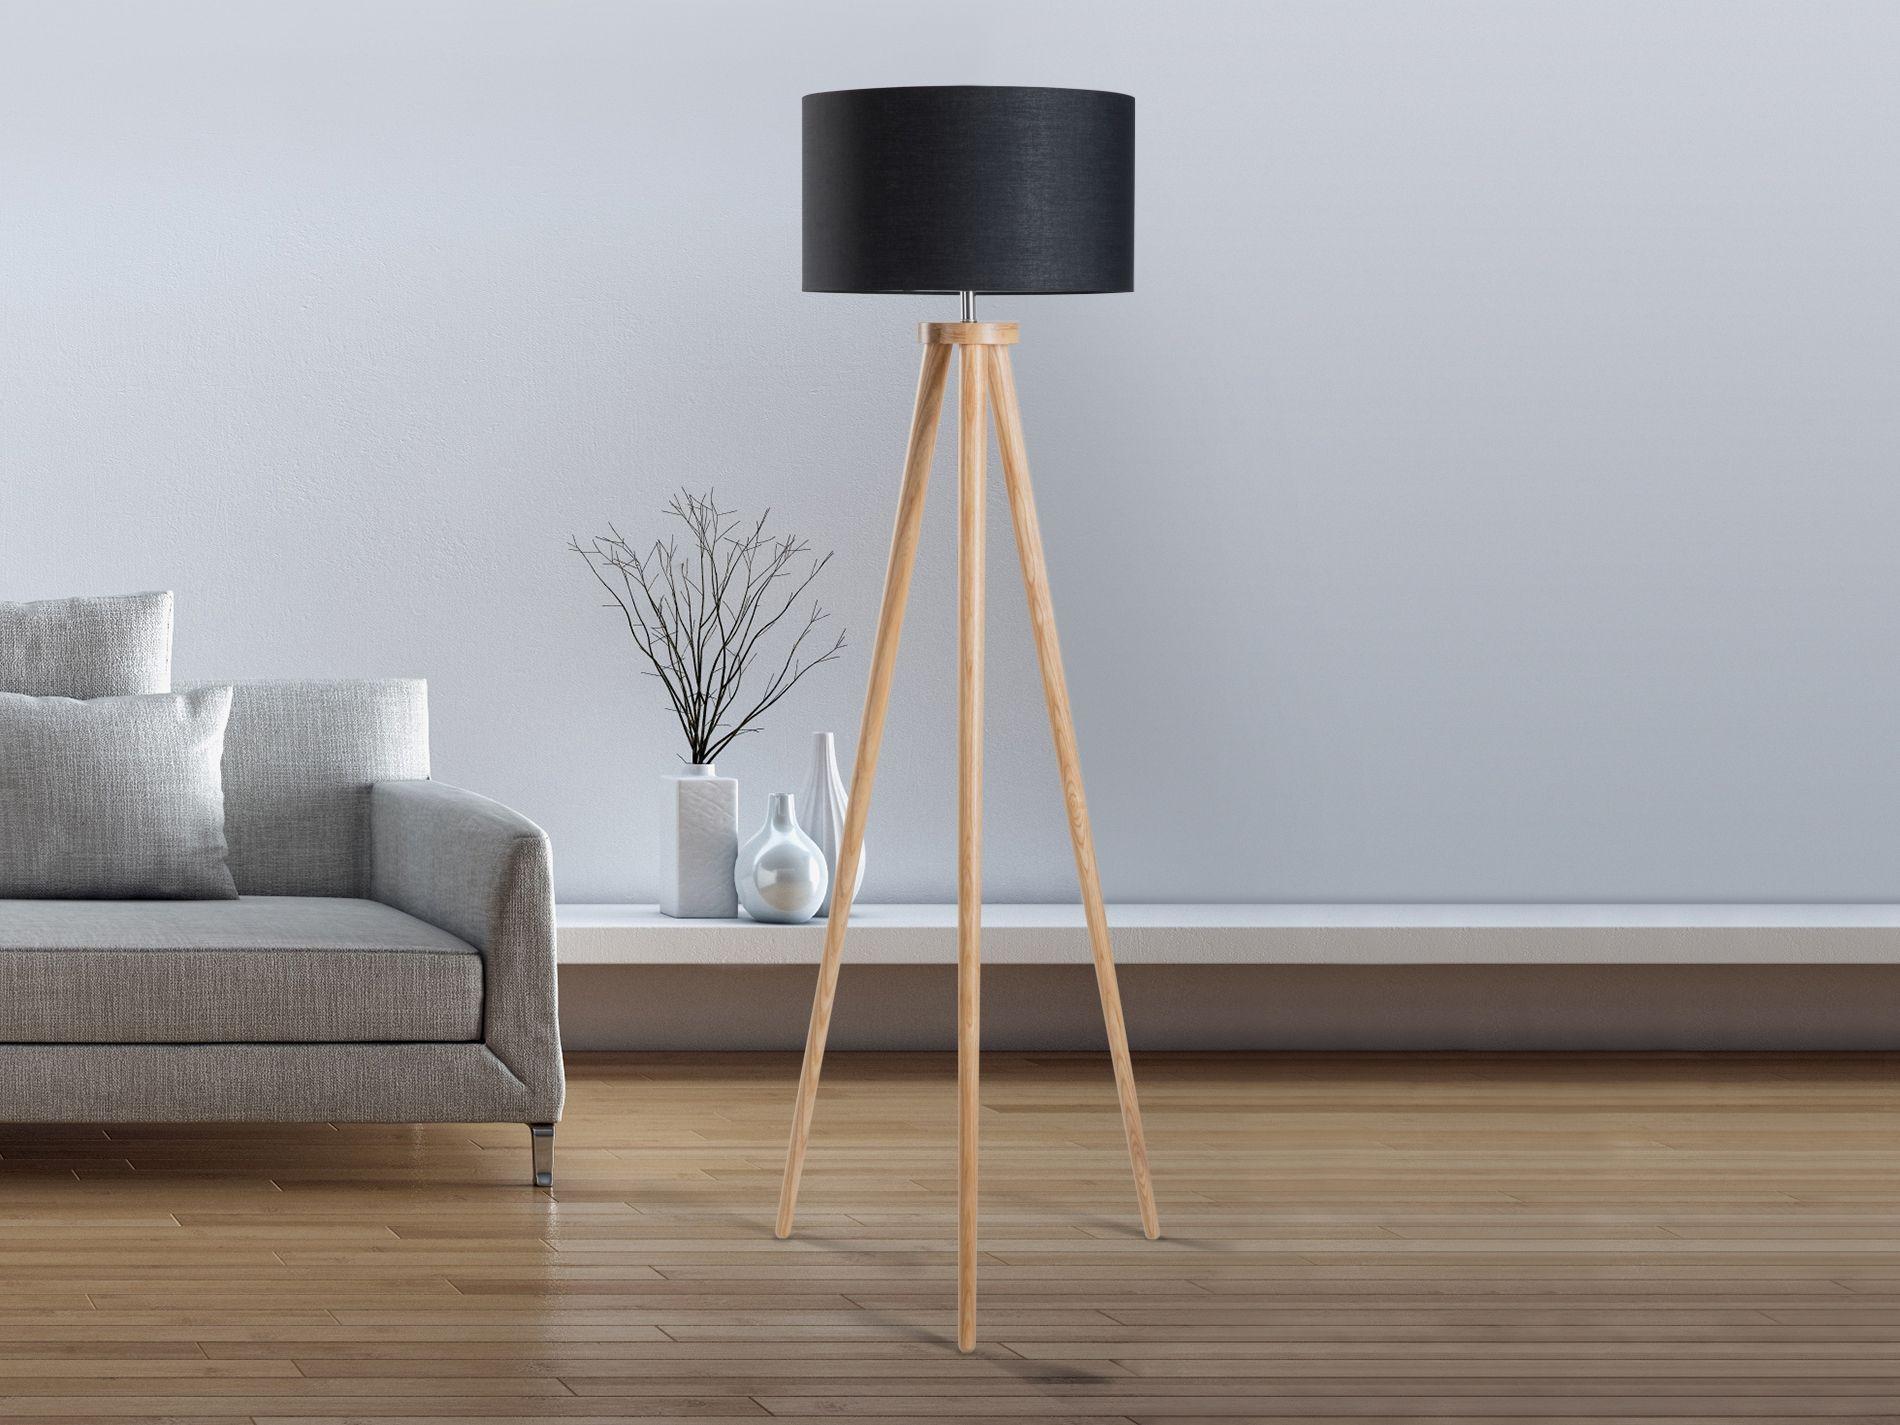 Lampadaire design luminaire lampe de salon noir Nitra